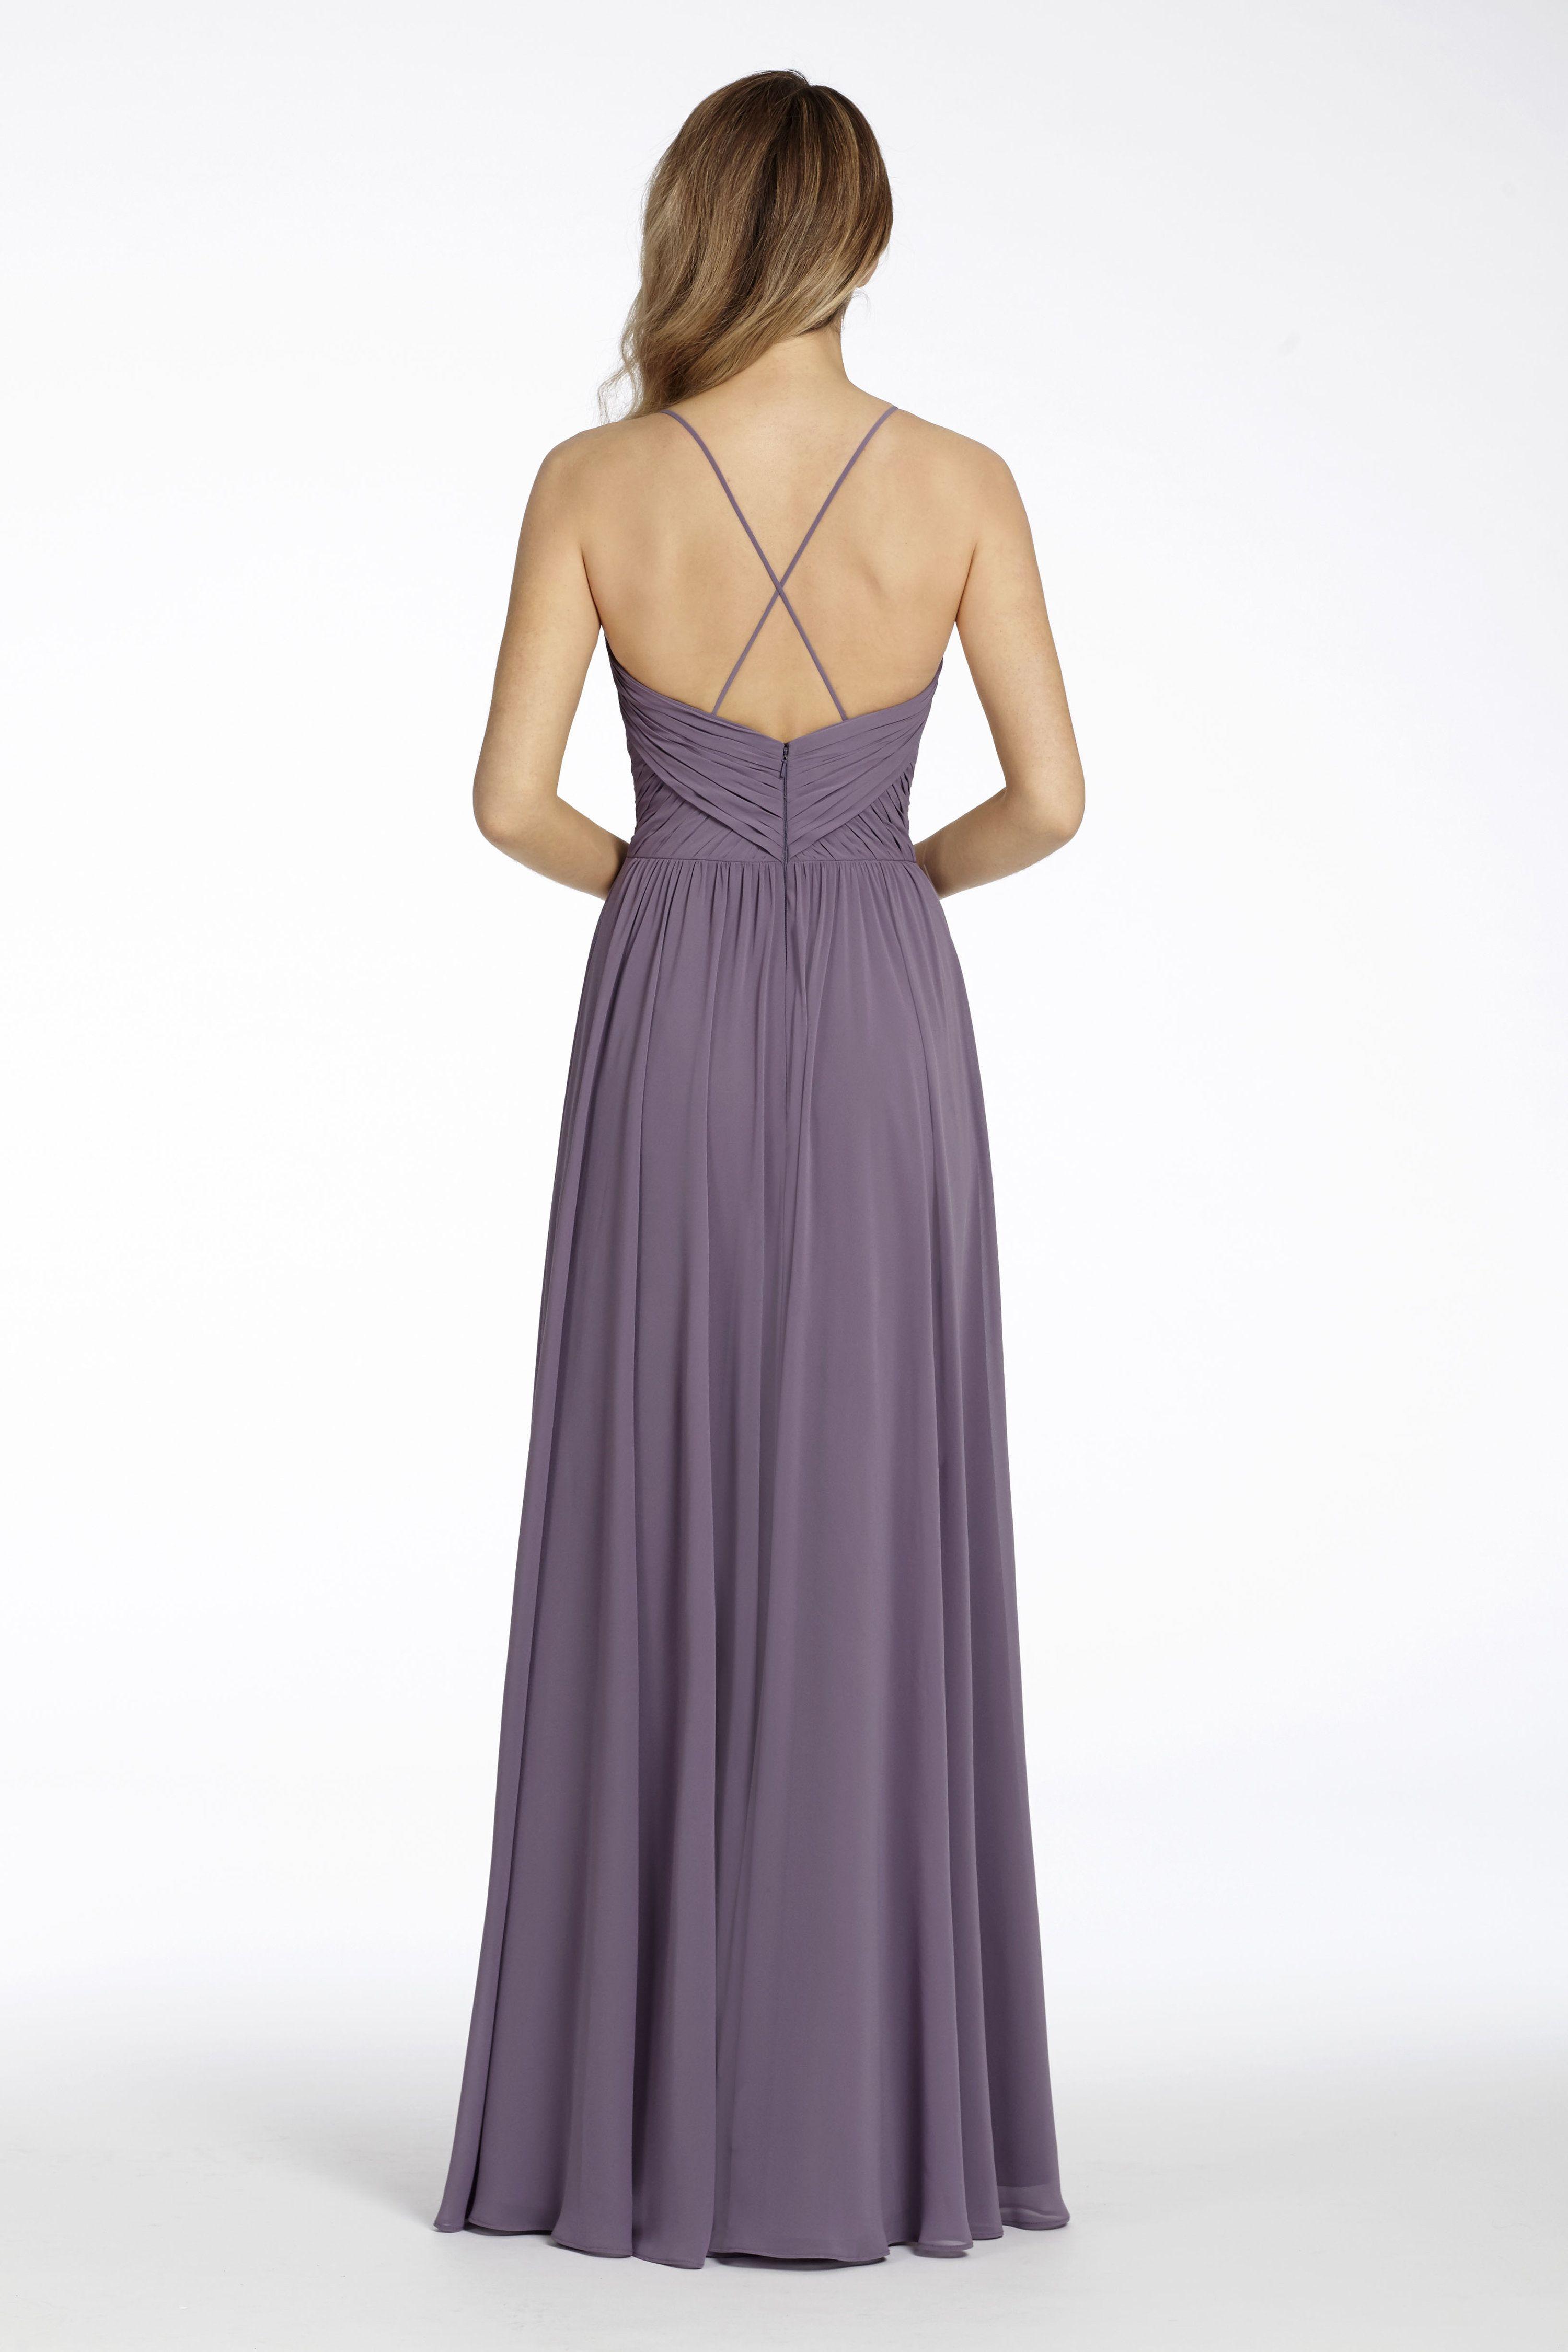 HAYLEY PAIGE OCCASIONS DRESSES: JIM HJELM 5704 | Wedding | Pinterest ...